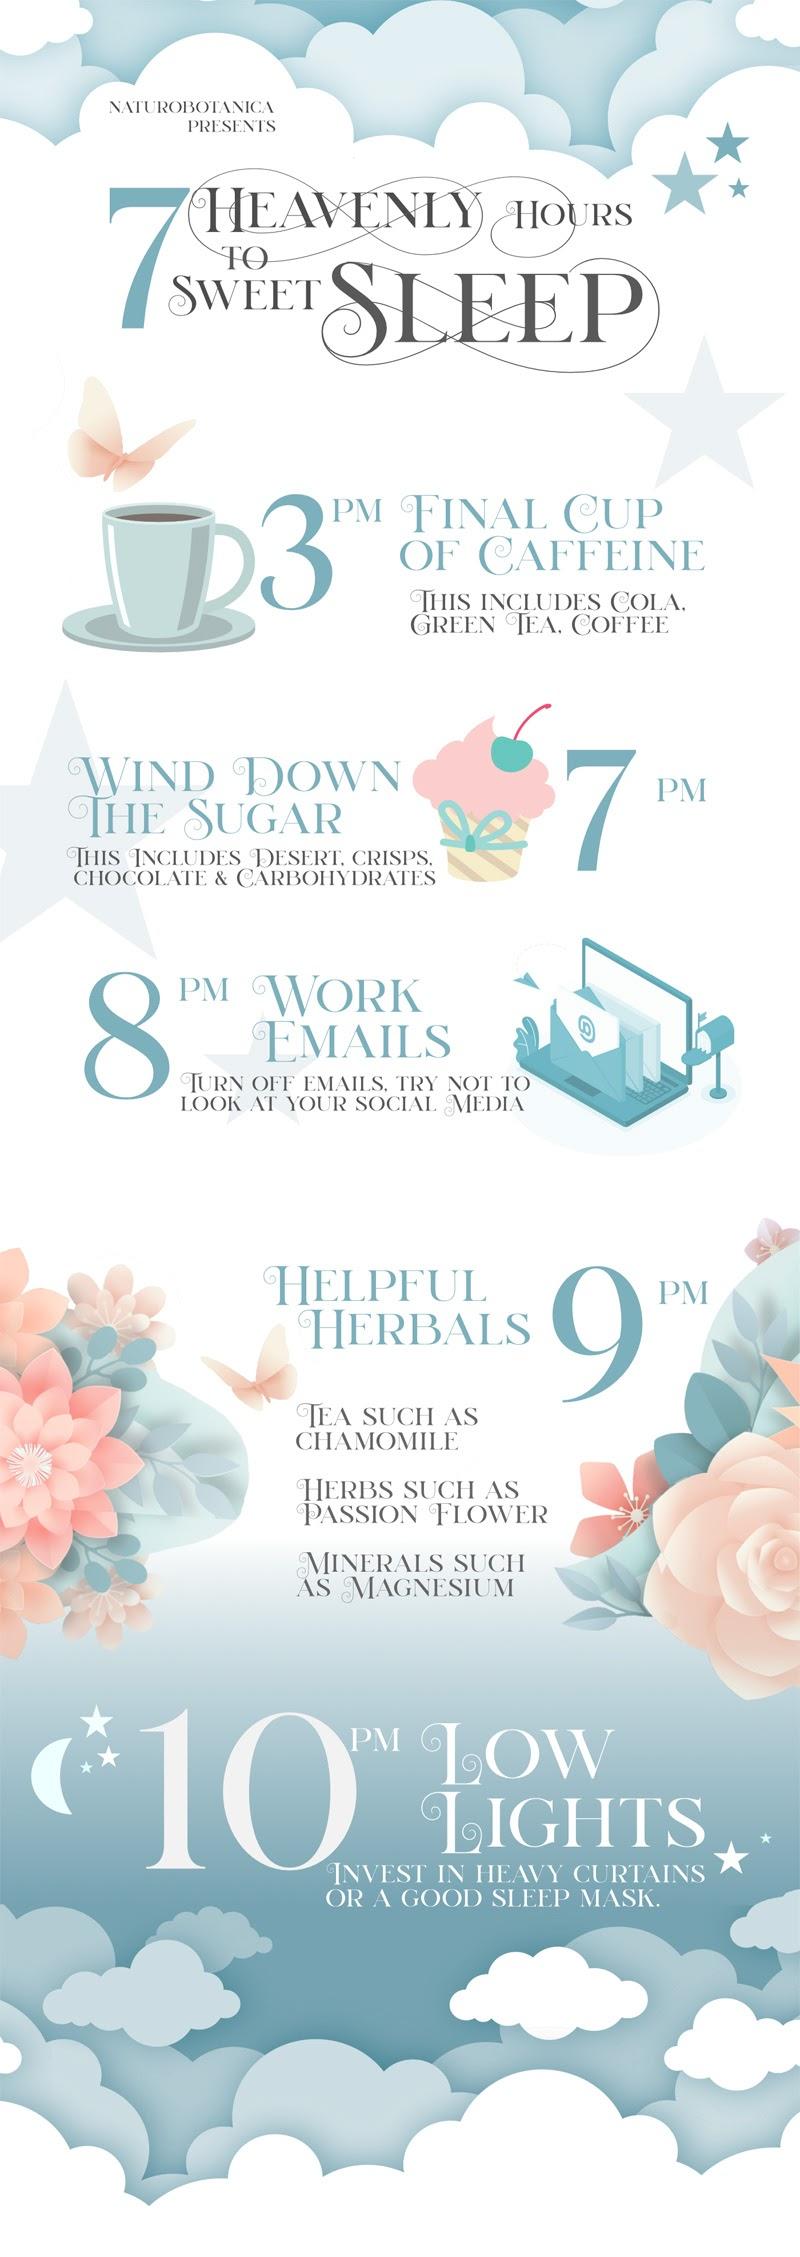 Seven hours to Sweet Sleep #infographic